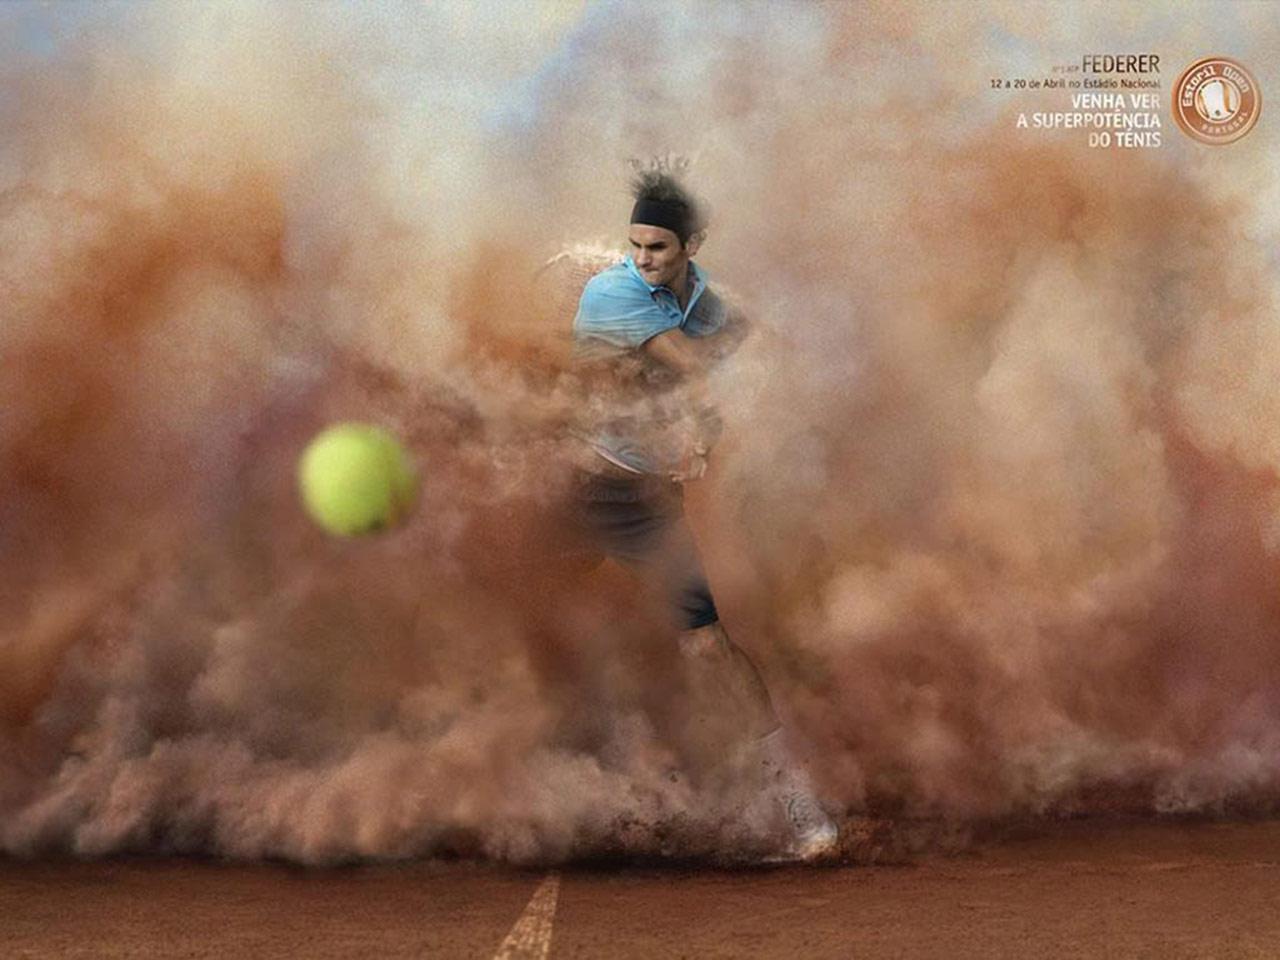 http://4.bp.blogspot.com/-yiFOvBCsP90/TgKN7l9YB7I/AAAAAAAAA_0/n0tro_HR2ig/s1600/Roger-Federer-Wallpaper.jpg